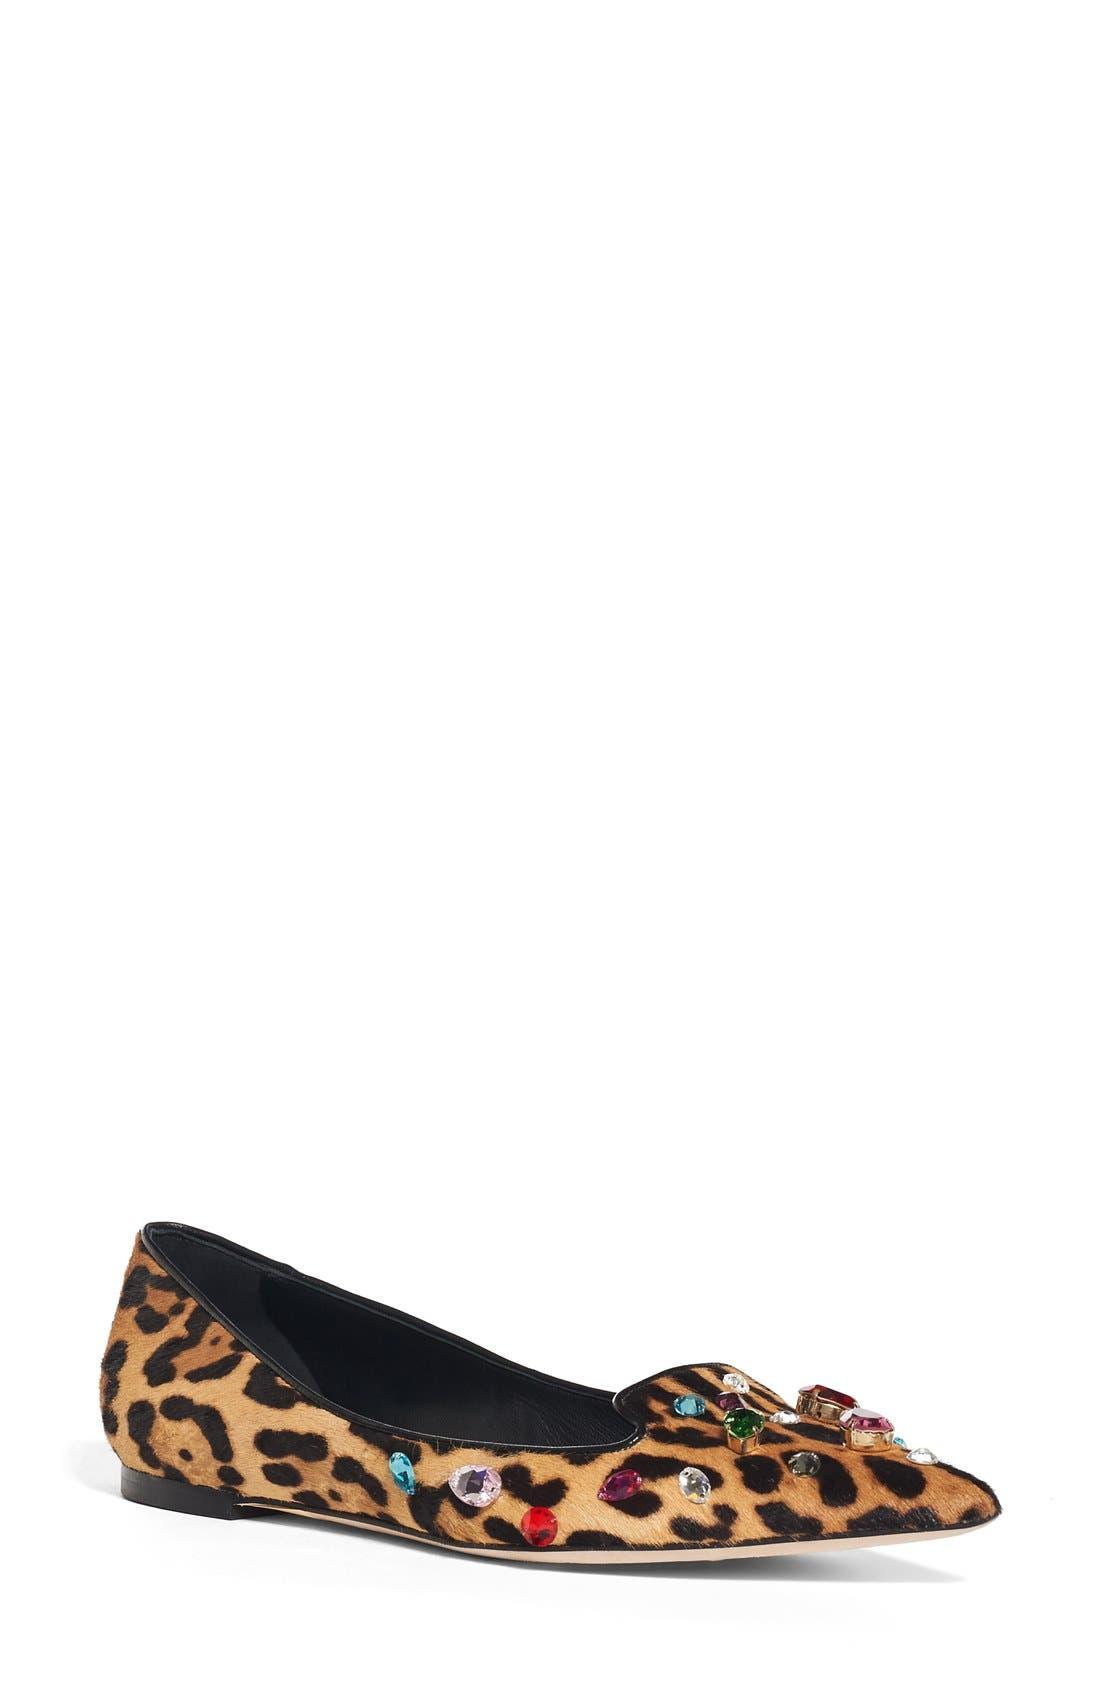 DOLCE&GABBANA Leo Embellished Leopard Print Flat